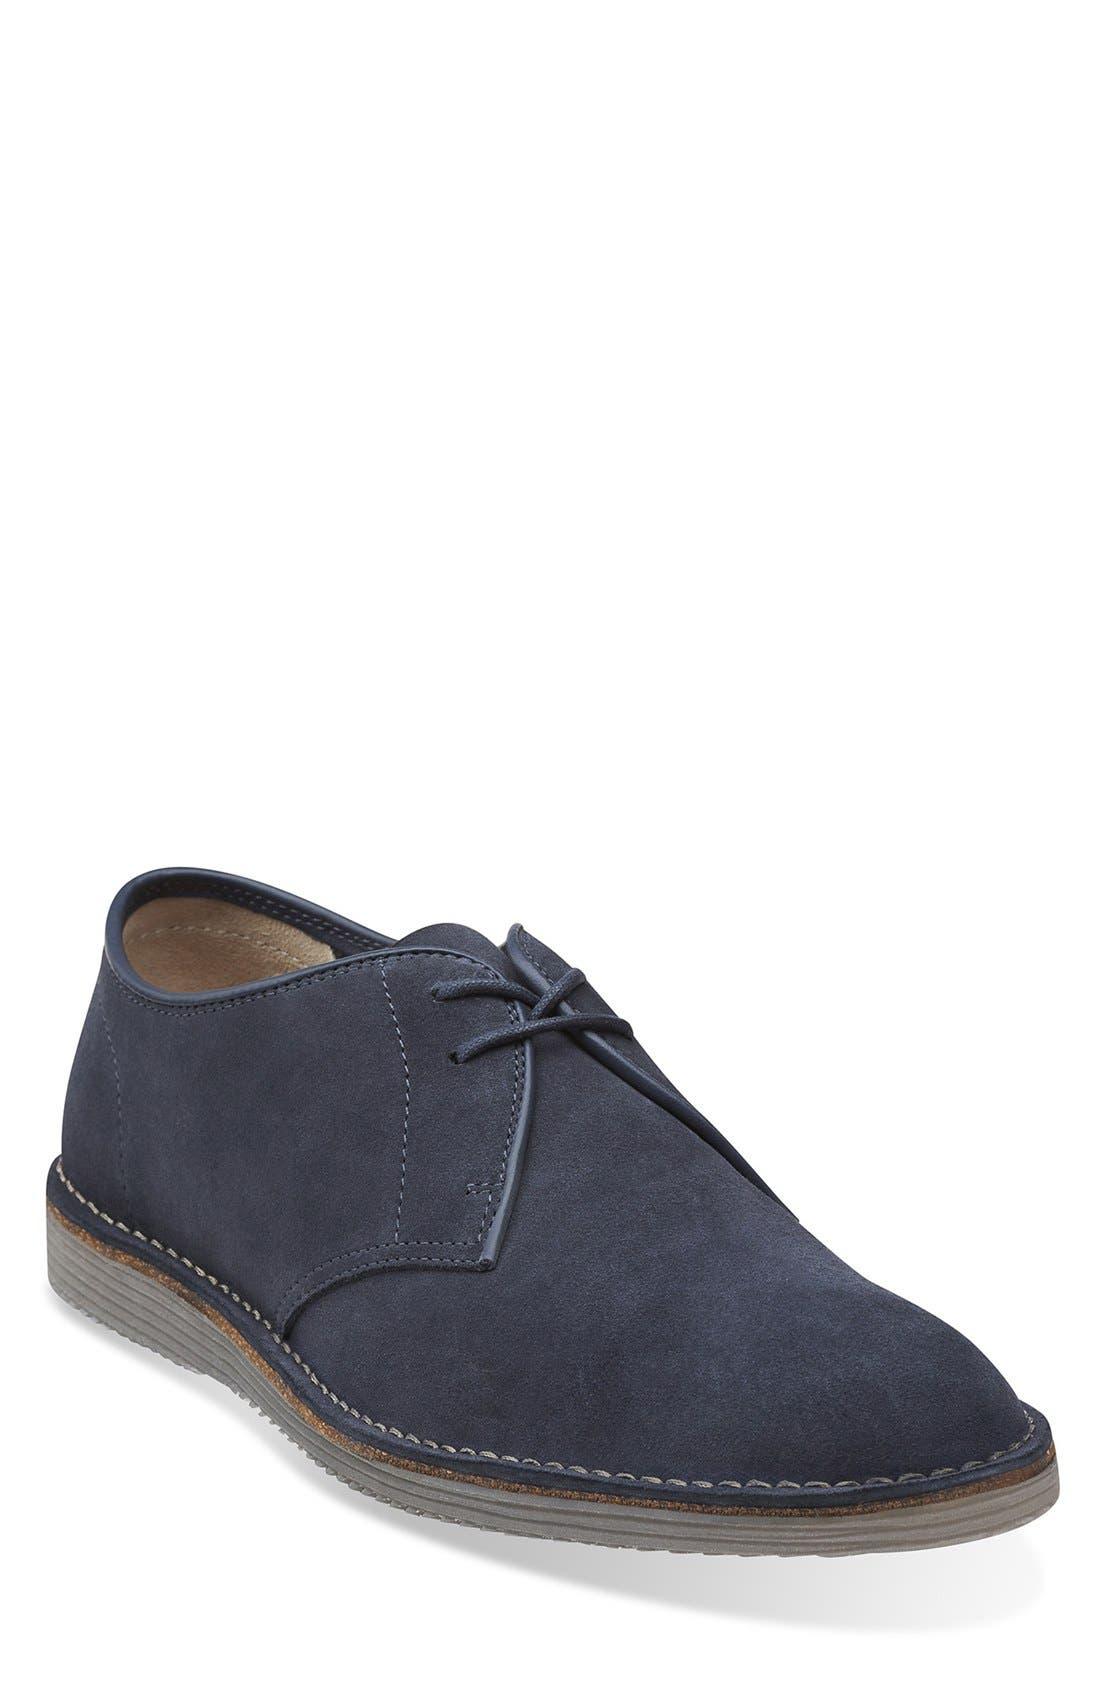 Main Image - Clarks® 'Darning Walk' Suede Buck Shoe (Men)